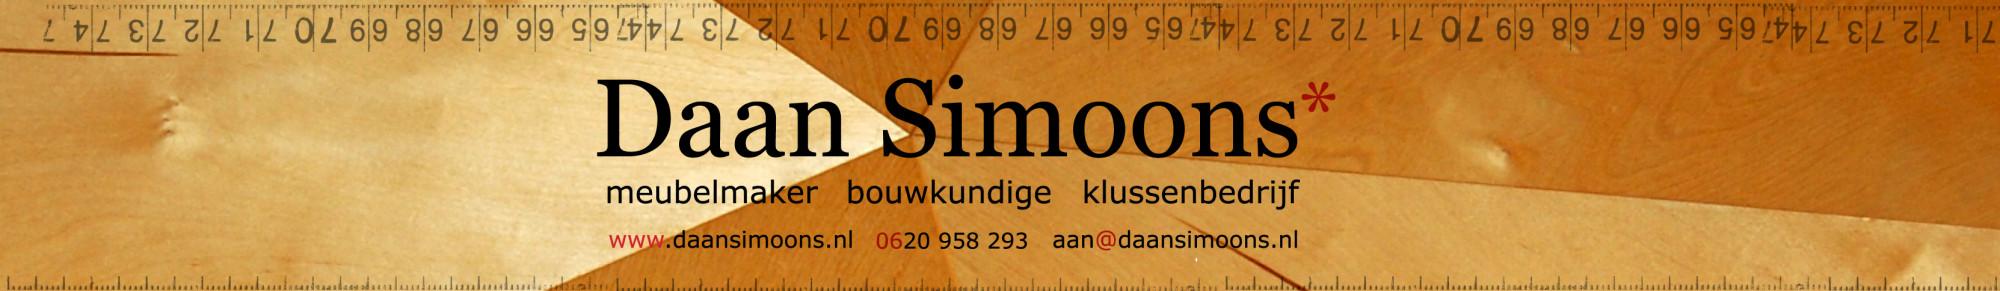 Daan Simoons